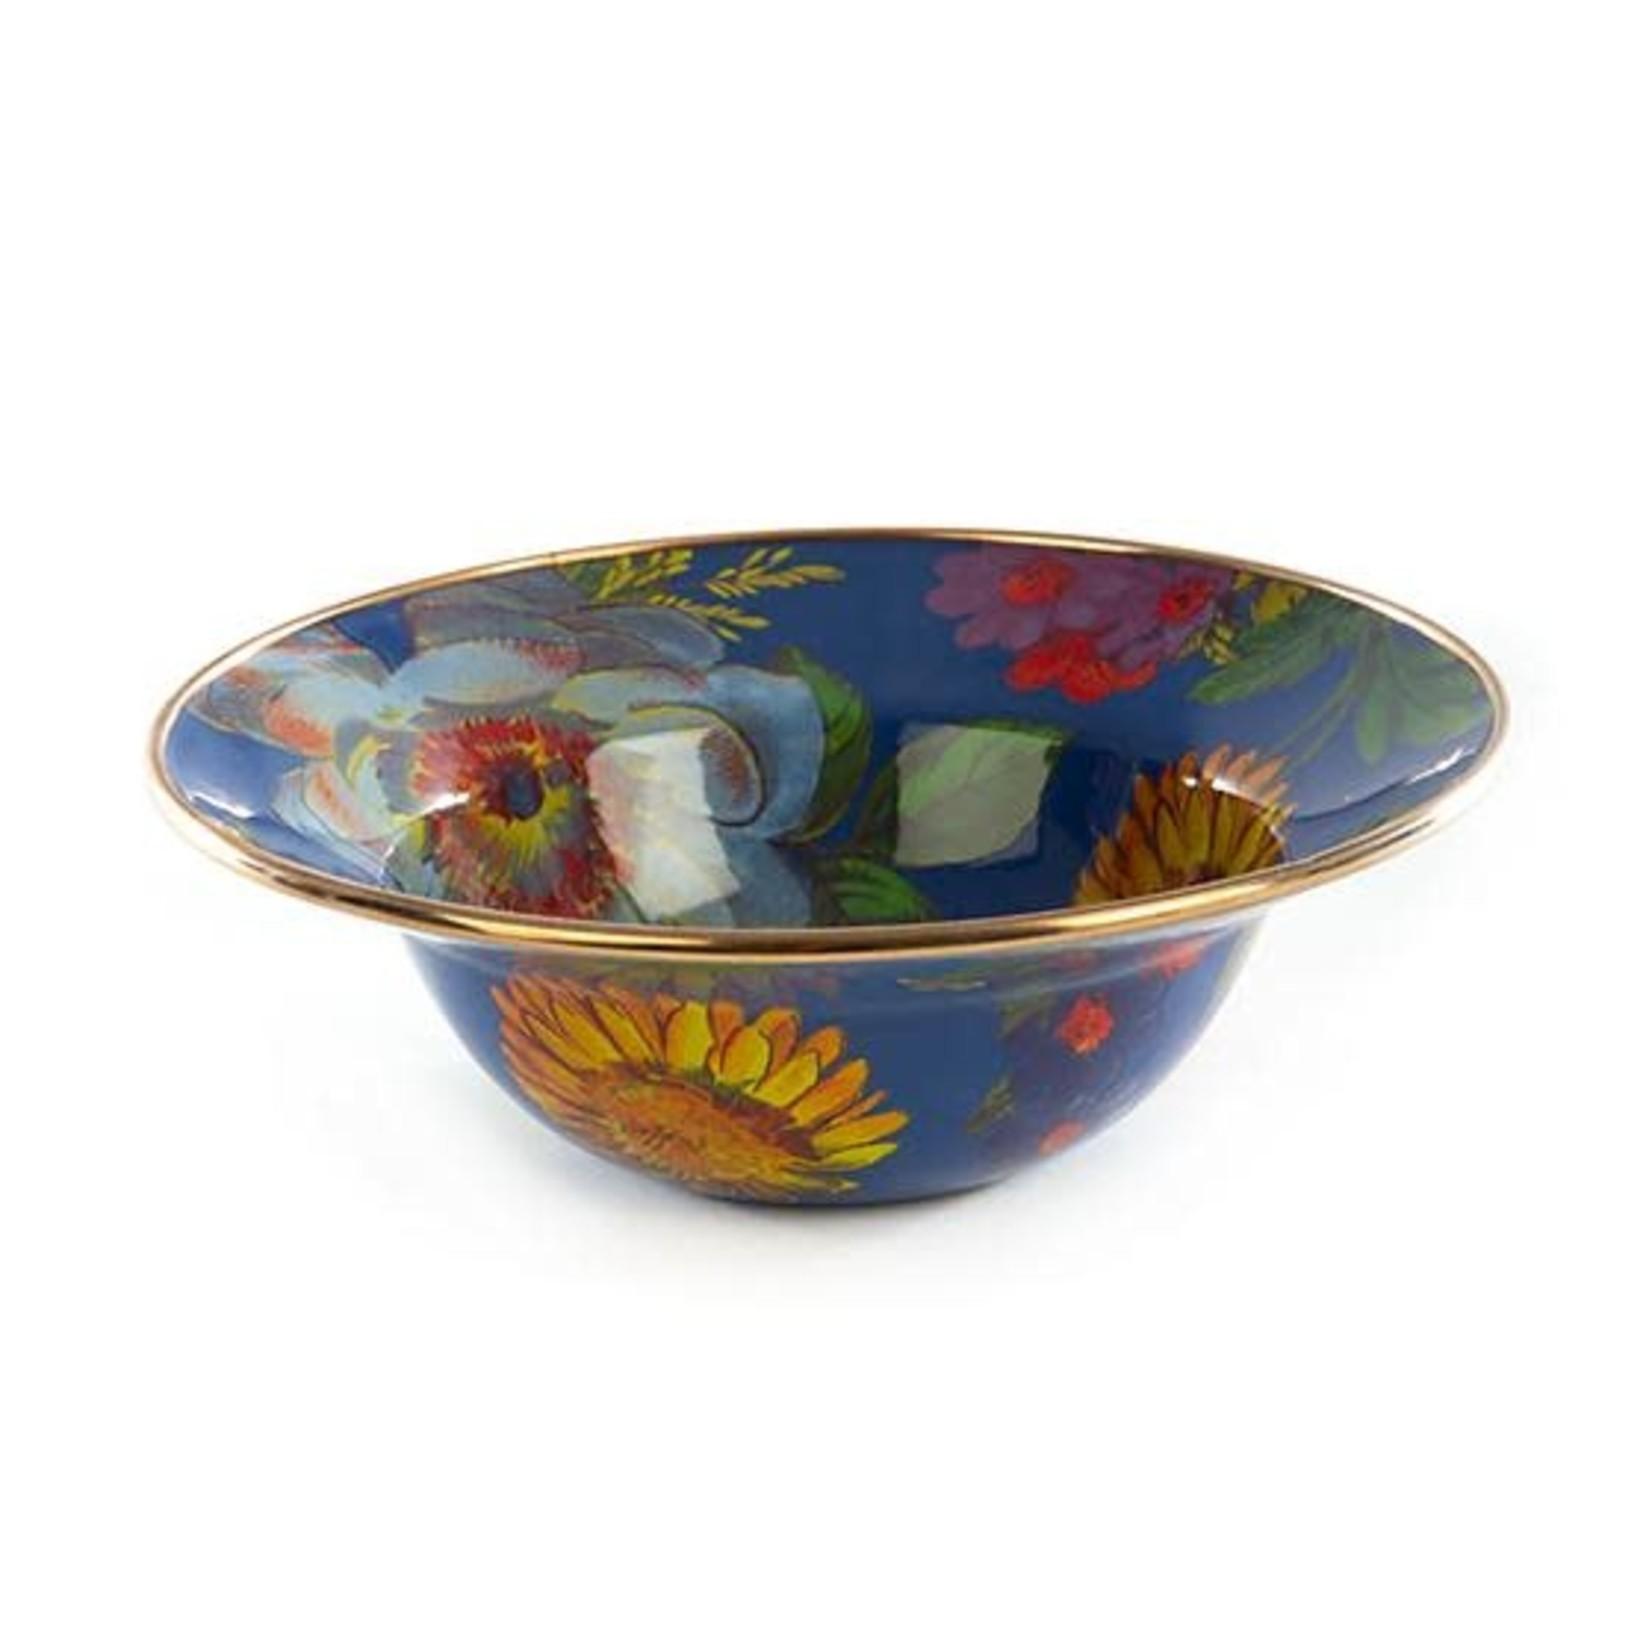 MacKenzie Childs Flower Market Breakfast Bowl - Lapis